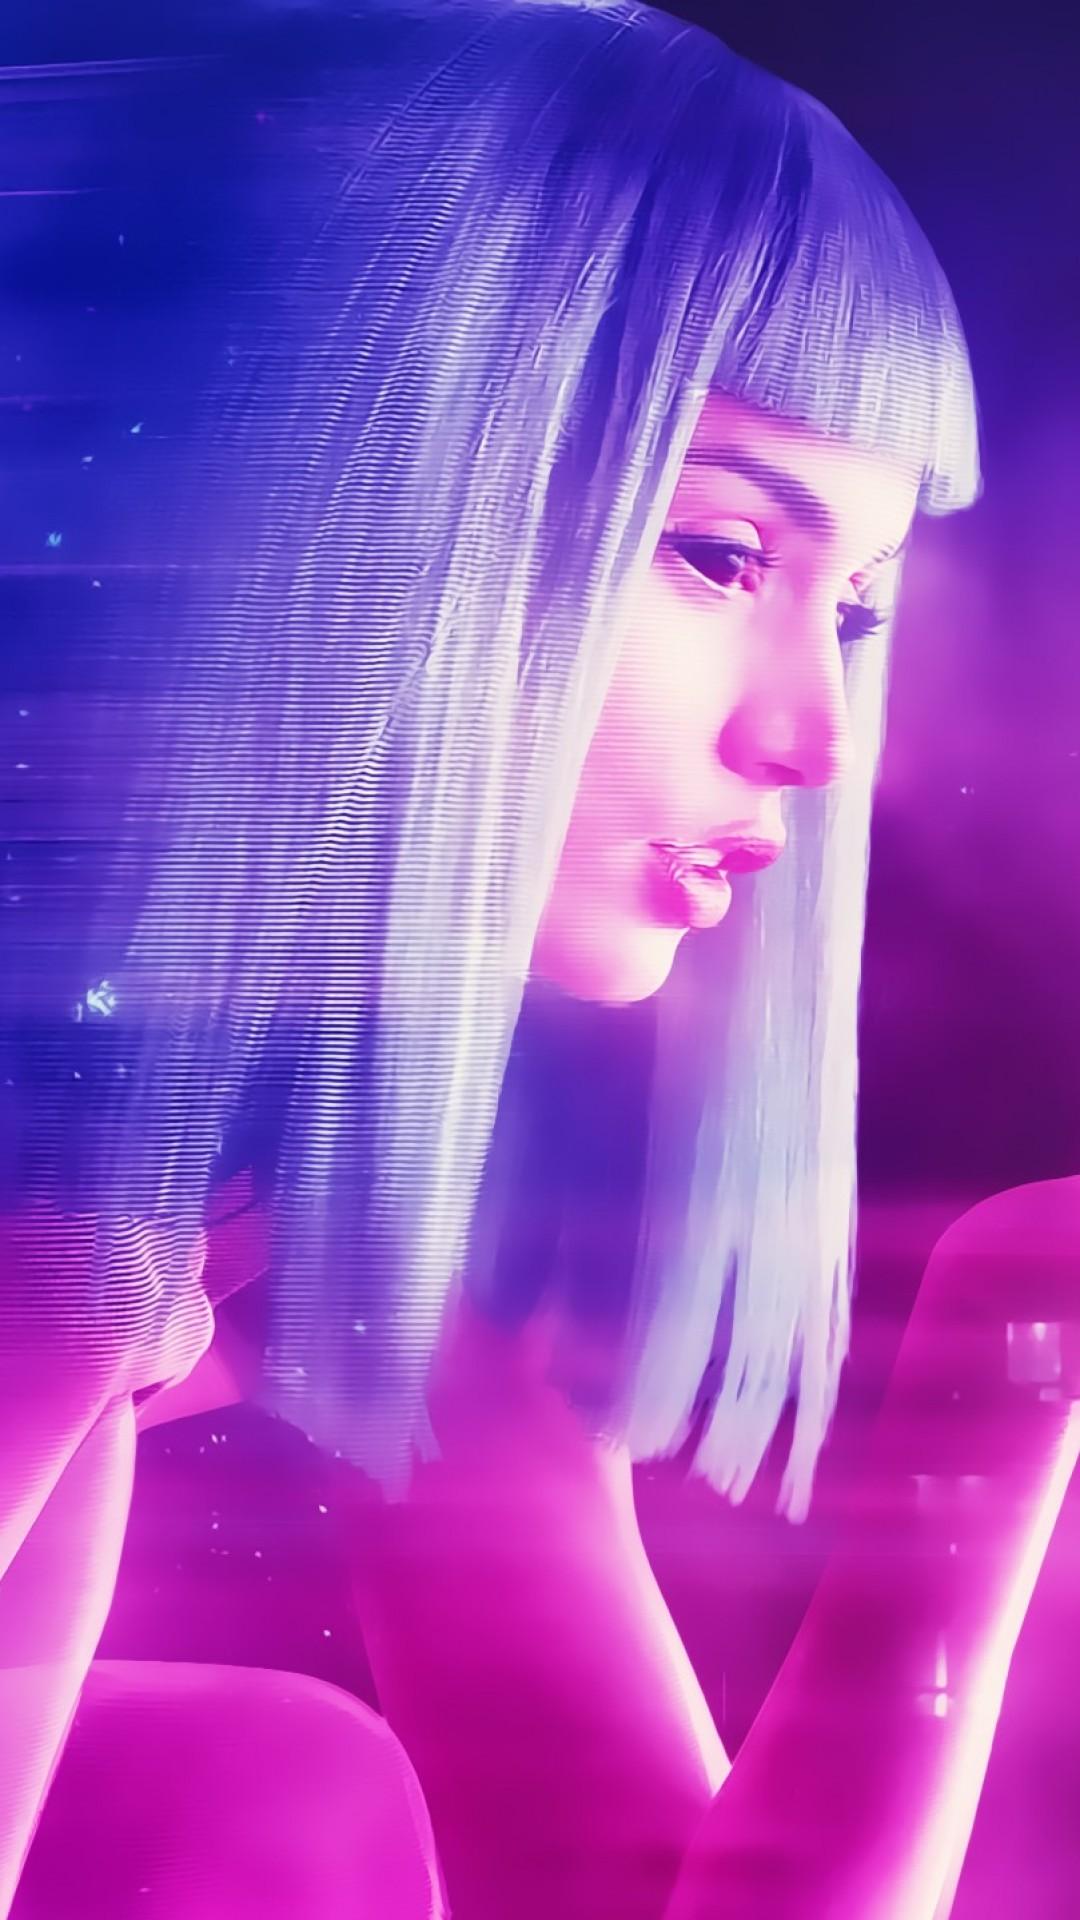 Wallpaper futuristic, cyberpunk, future world, 4K, Art #20445